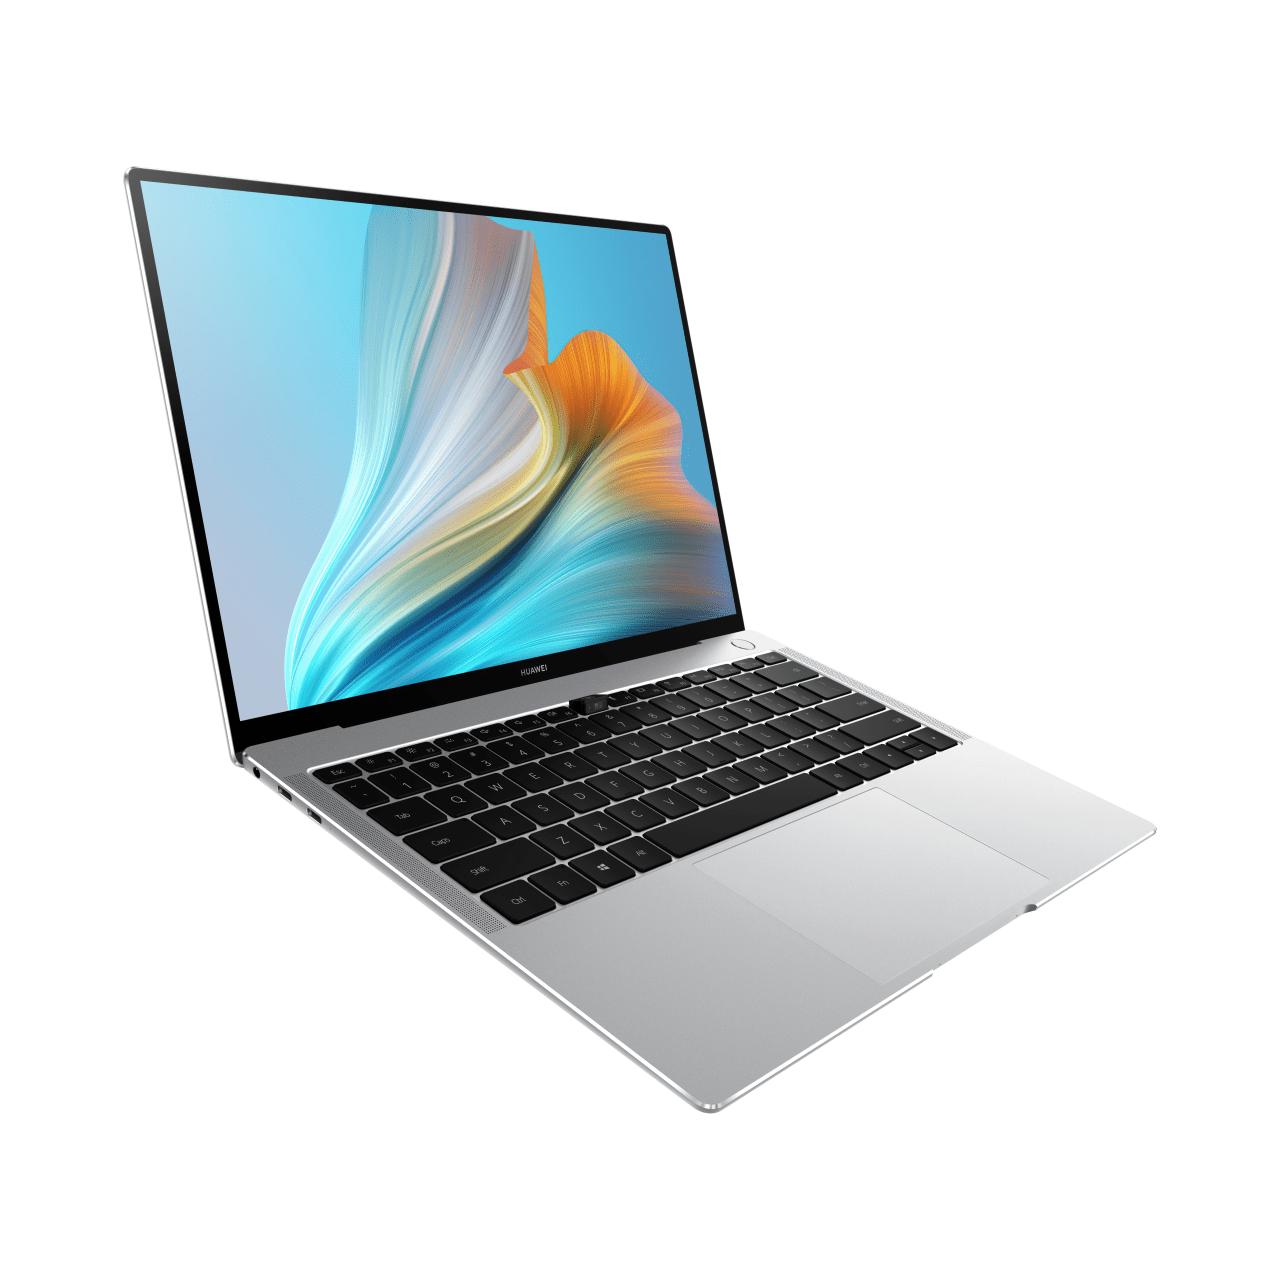 Huawei presents MateBook D 15, MateBook X Pro and AX3 WiFi